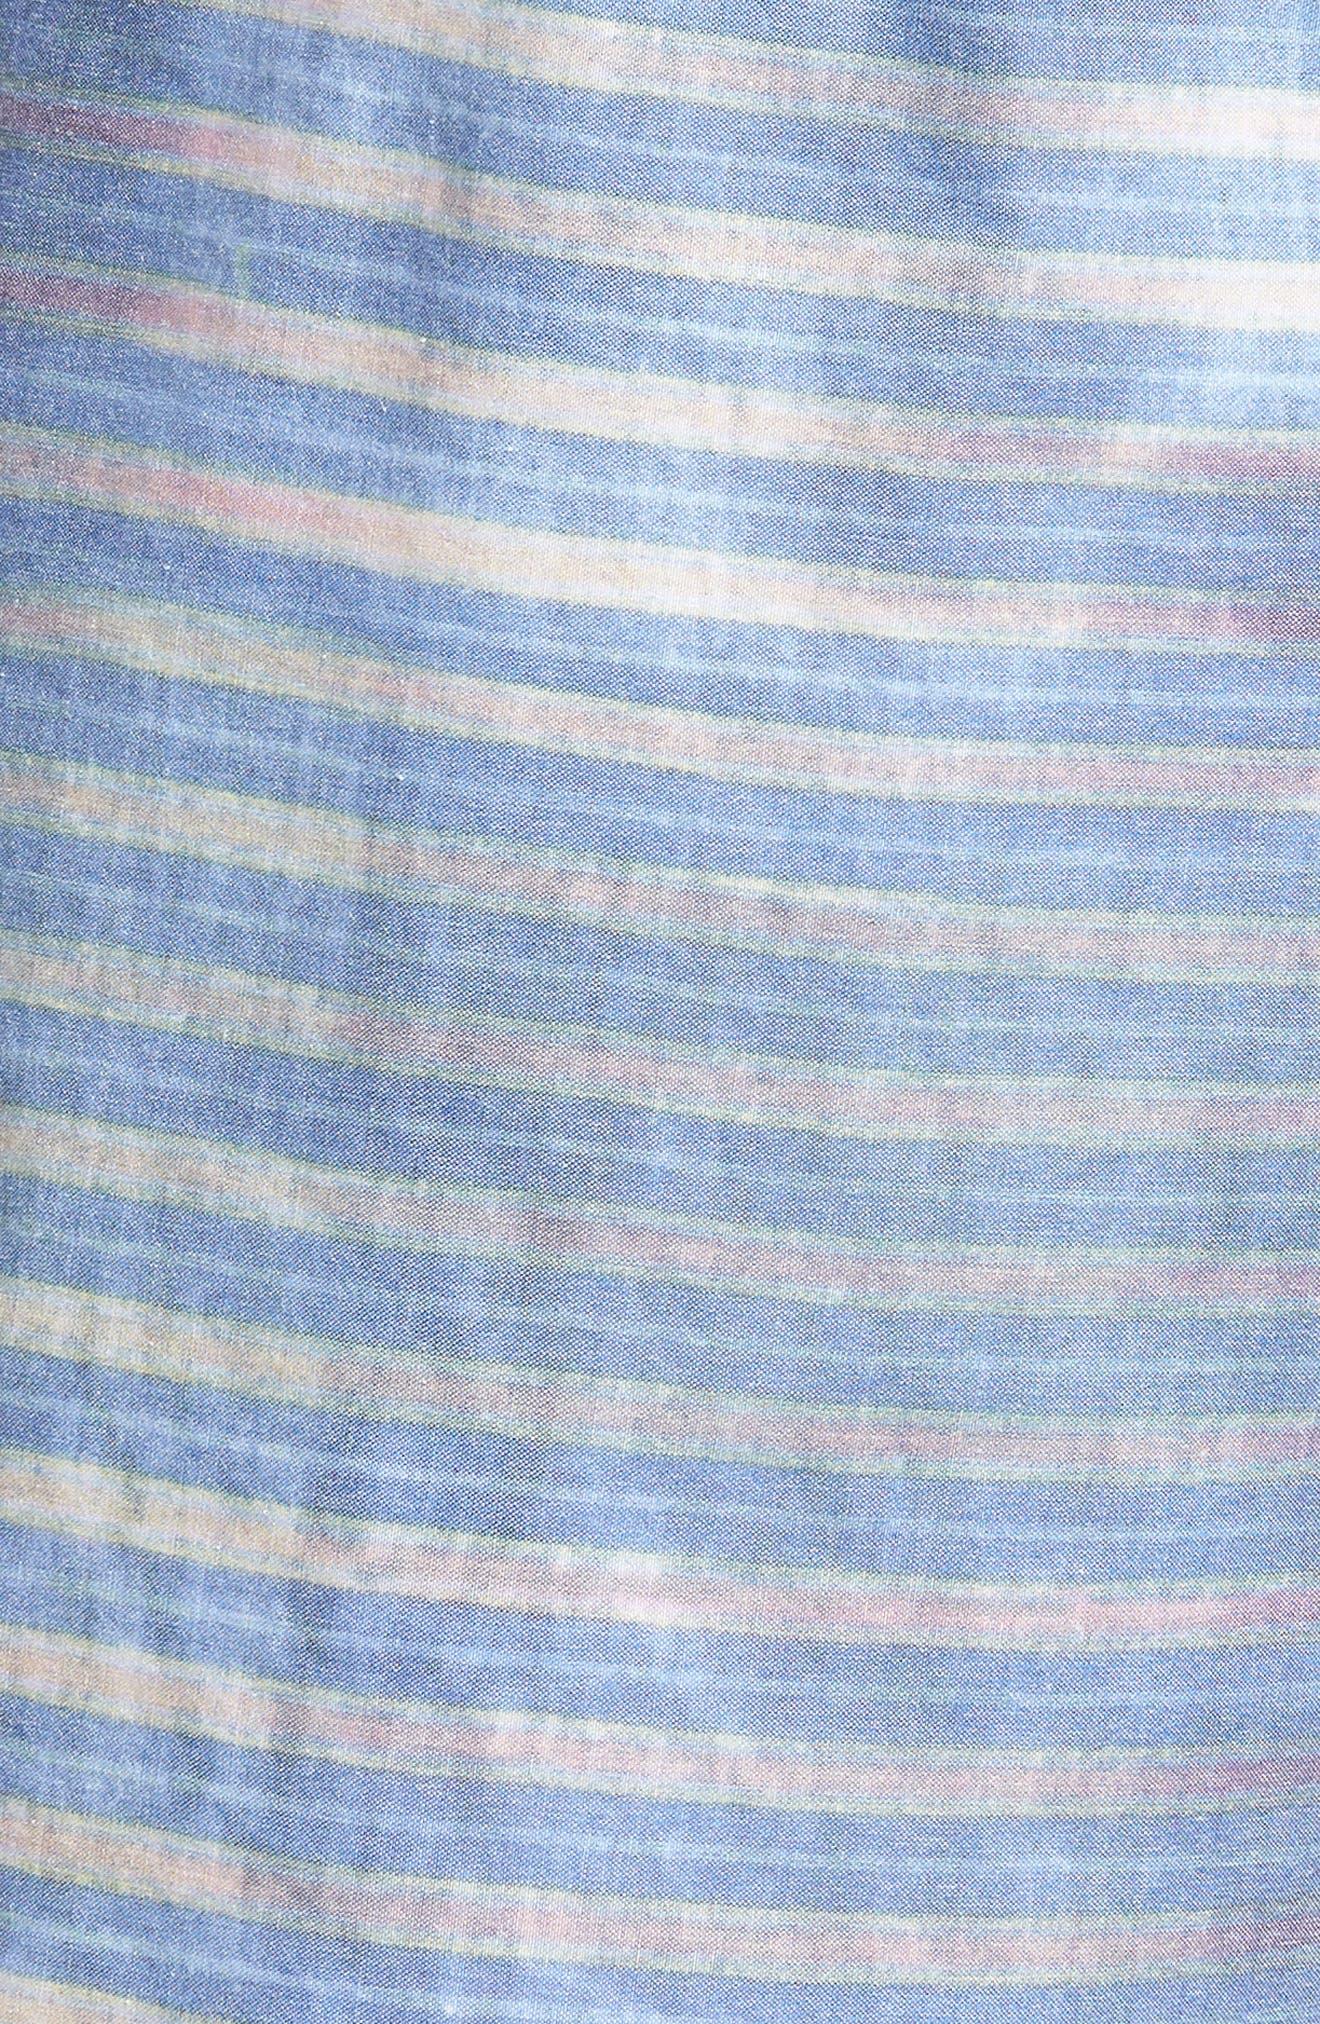 Boppa Stripe Swim Trunks,                             Alternate thumbnail 5, color,                             402